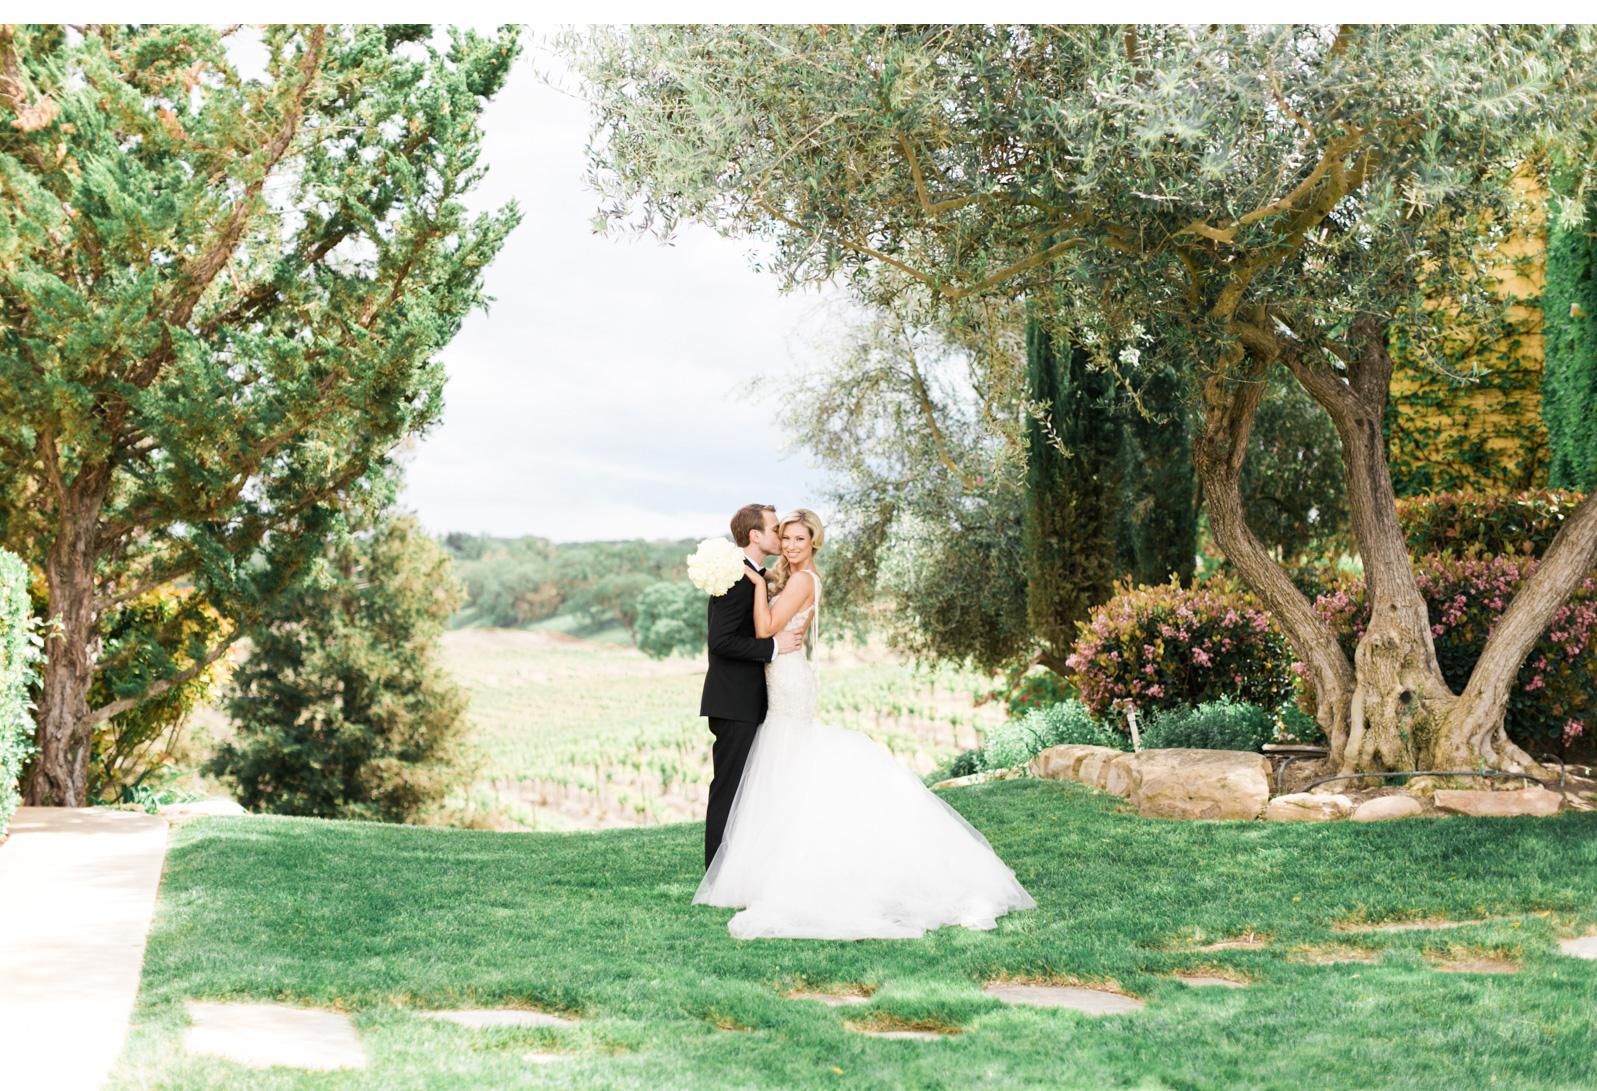 Southern-California-Wedding-Photographer-Natalie-Schutt-Photography_14.jpg